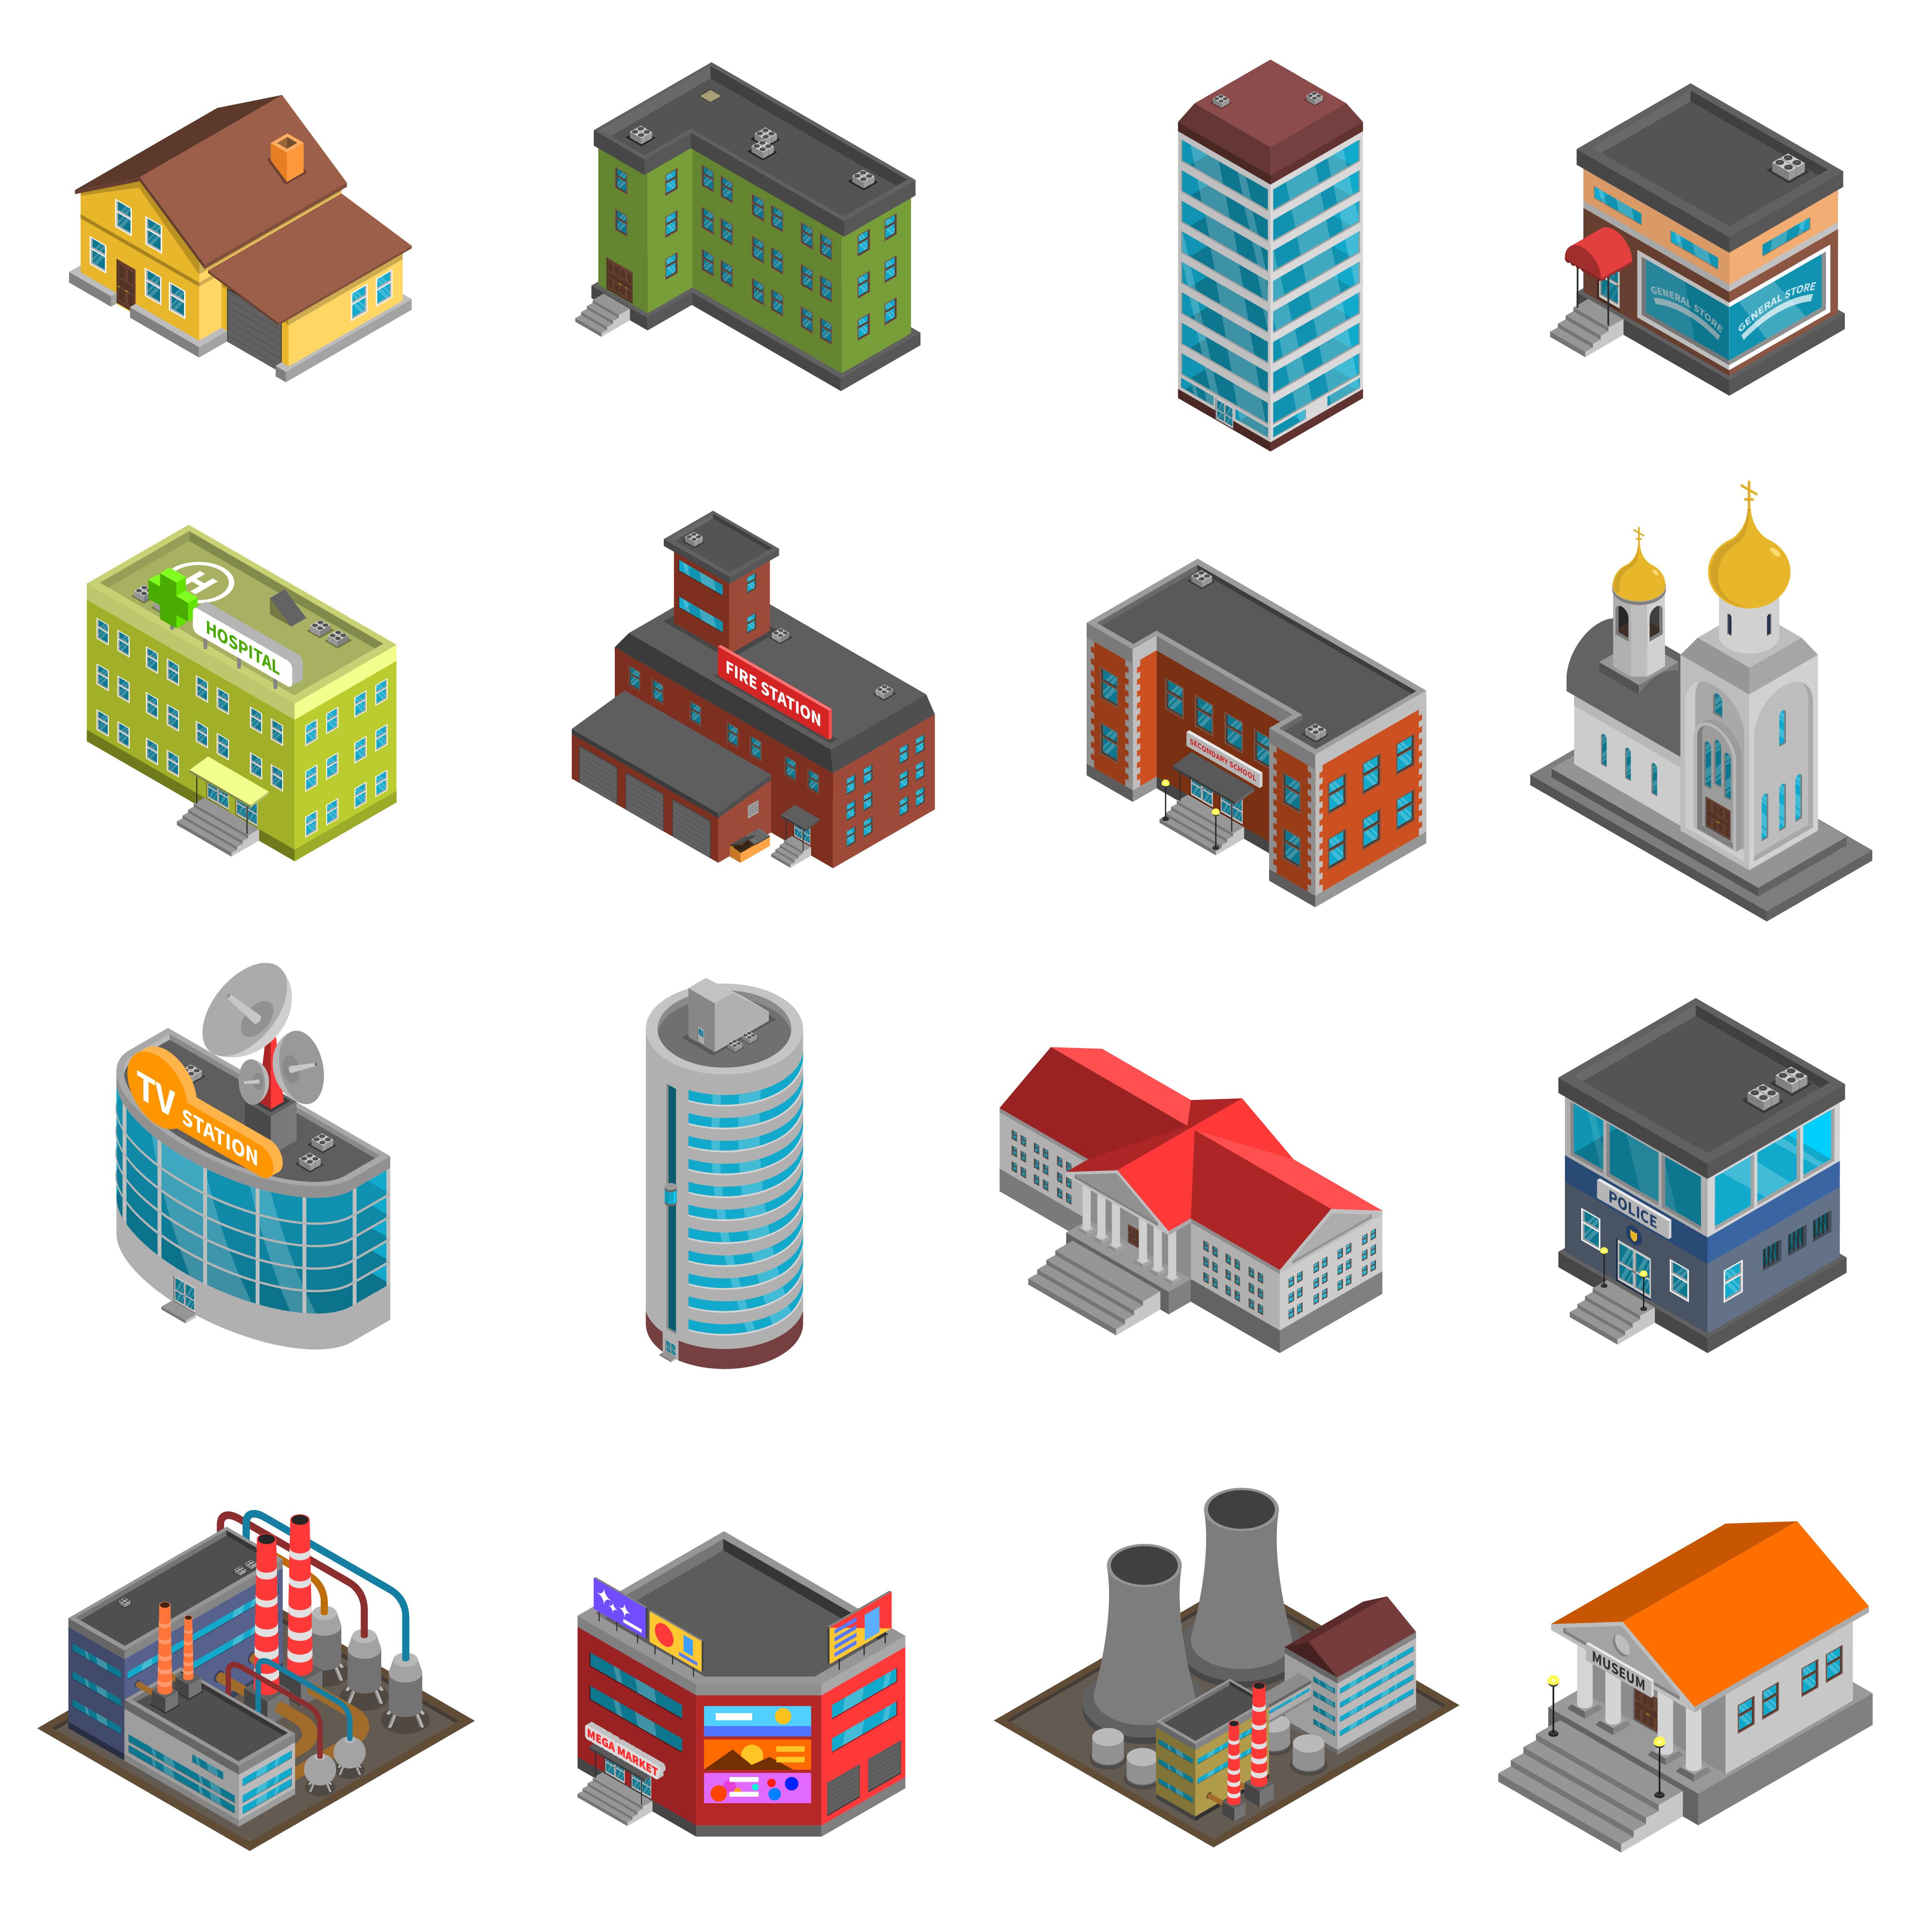 City Buildings Isometric Icons Set - Download Free Vectors, Clipart Graphics & Vector Art